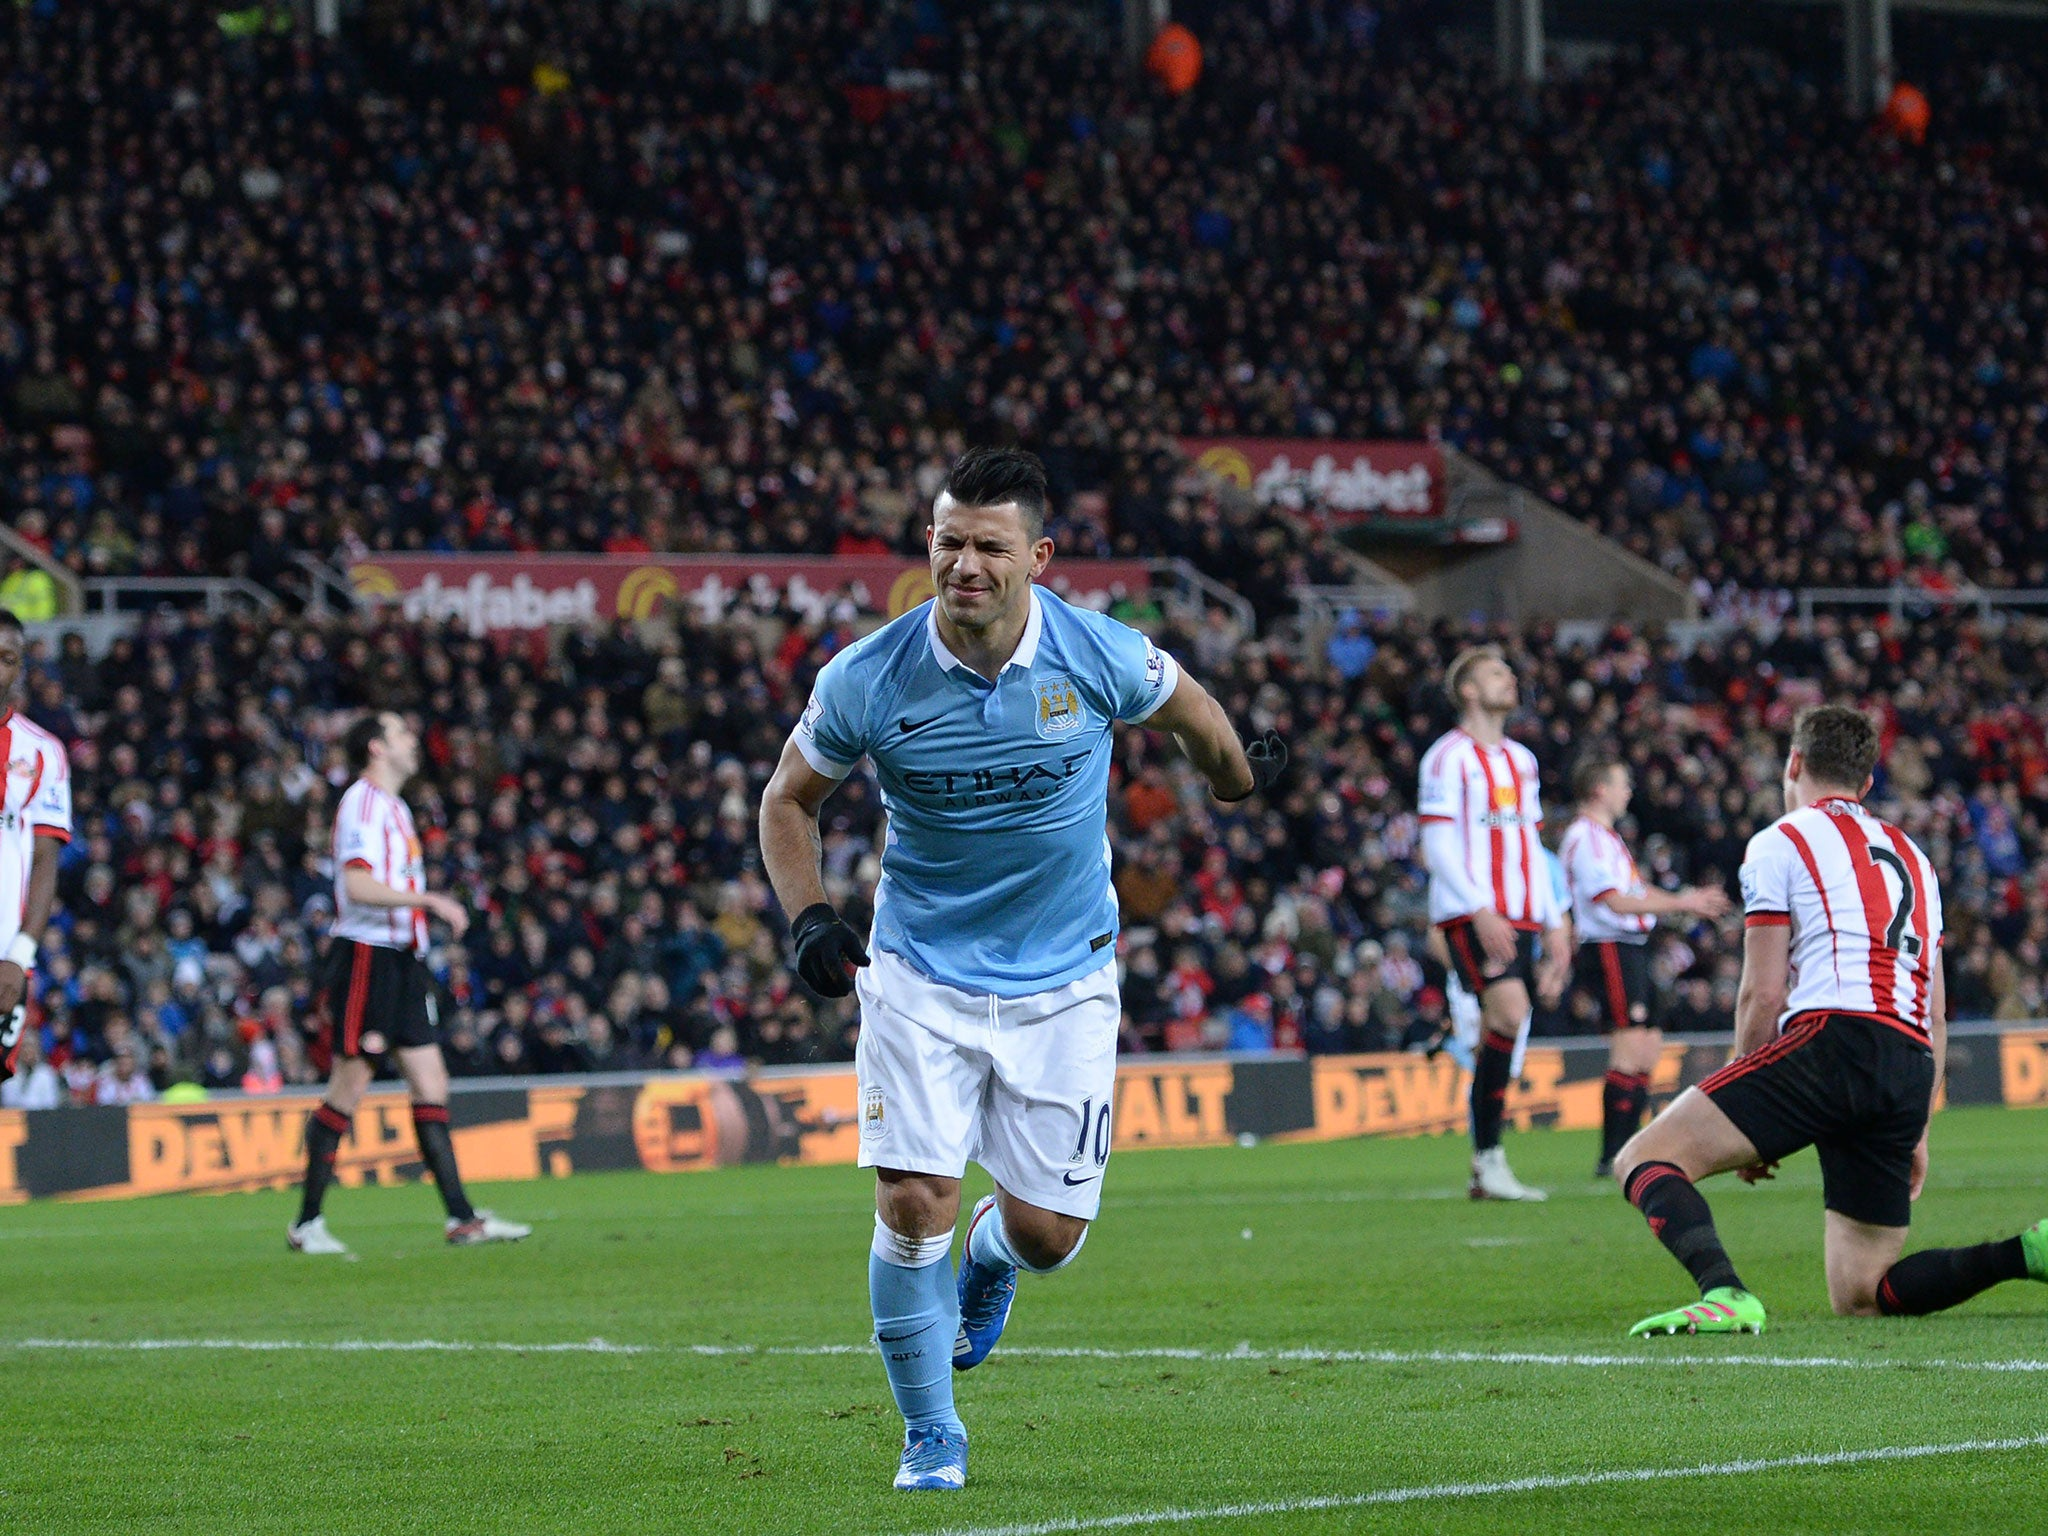 Sunderland vs Manchester City Sergio Aguero scores only goal as 2048x1536